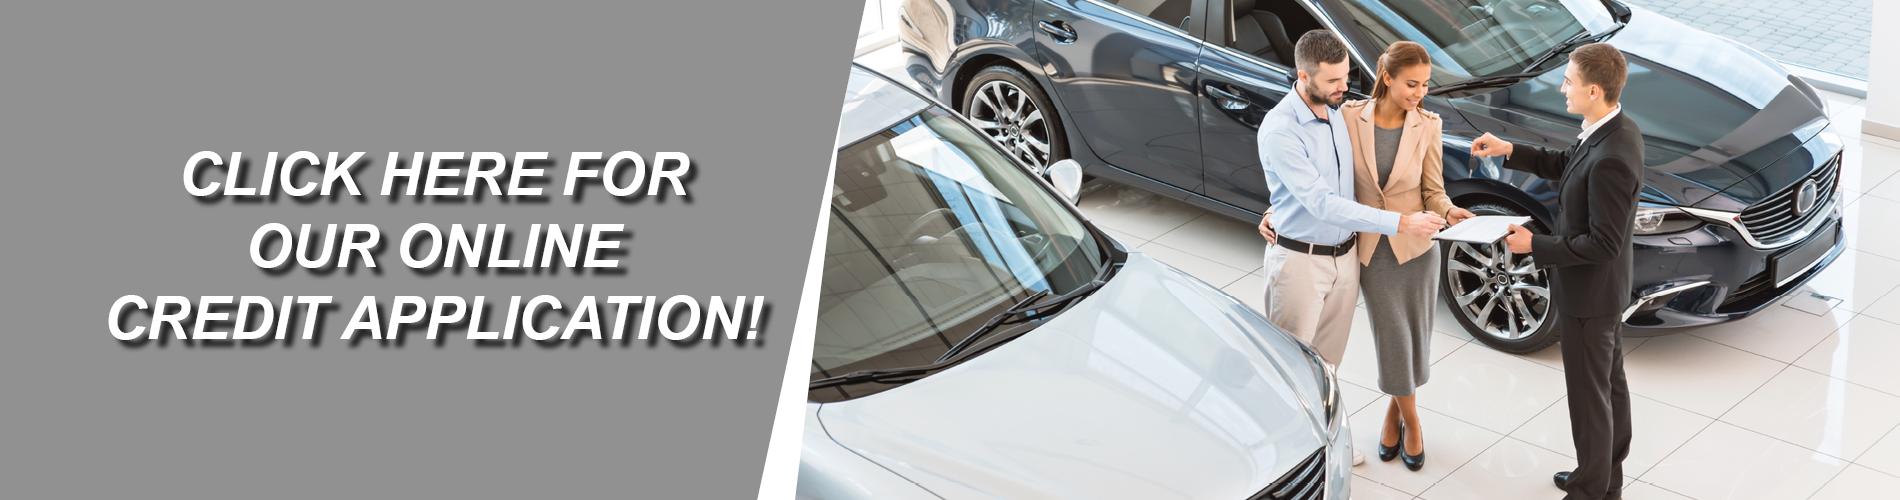 Gem Mazda | North Florida New & Pre-Owned Mazda Dealership